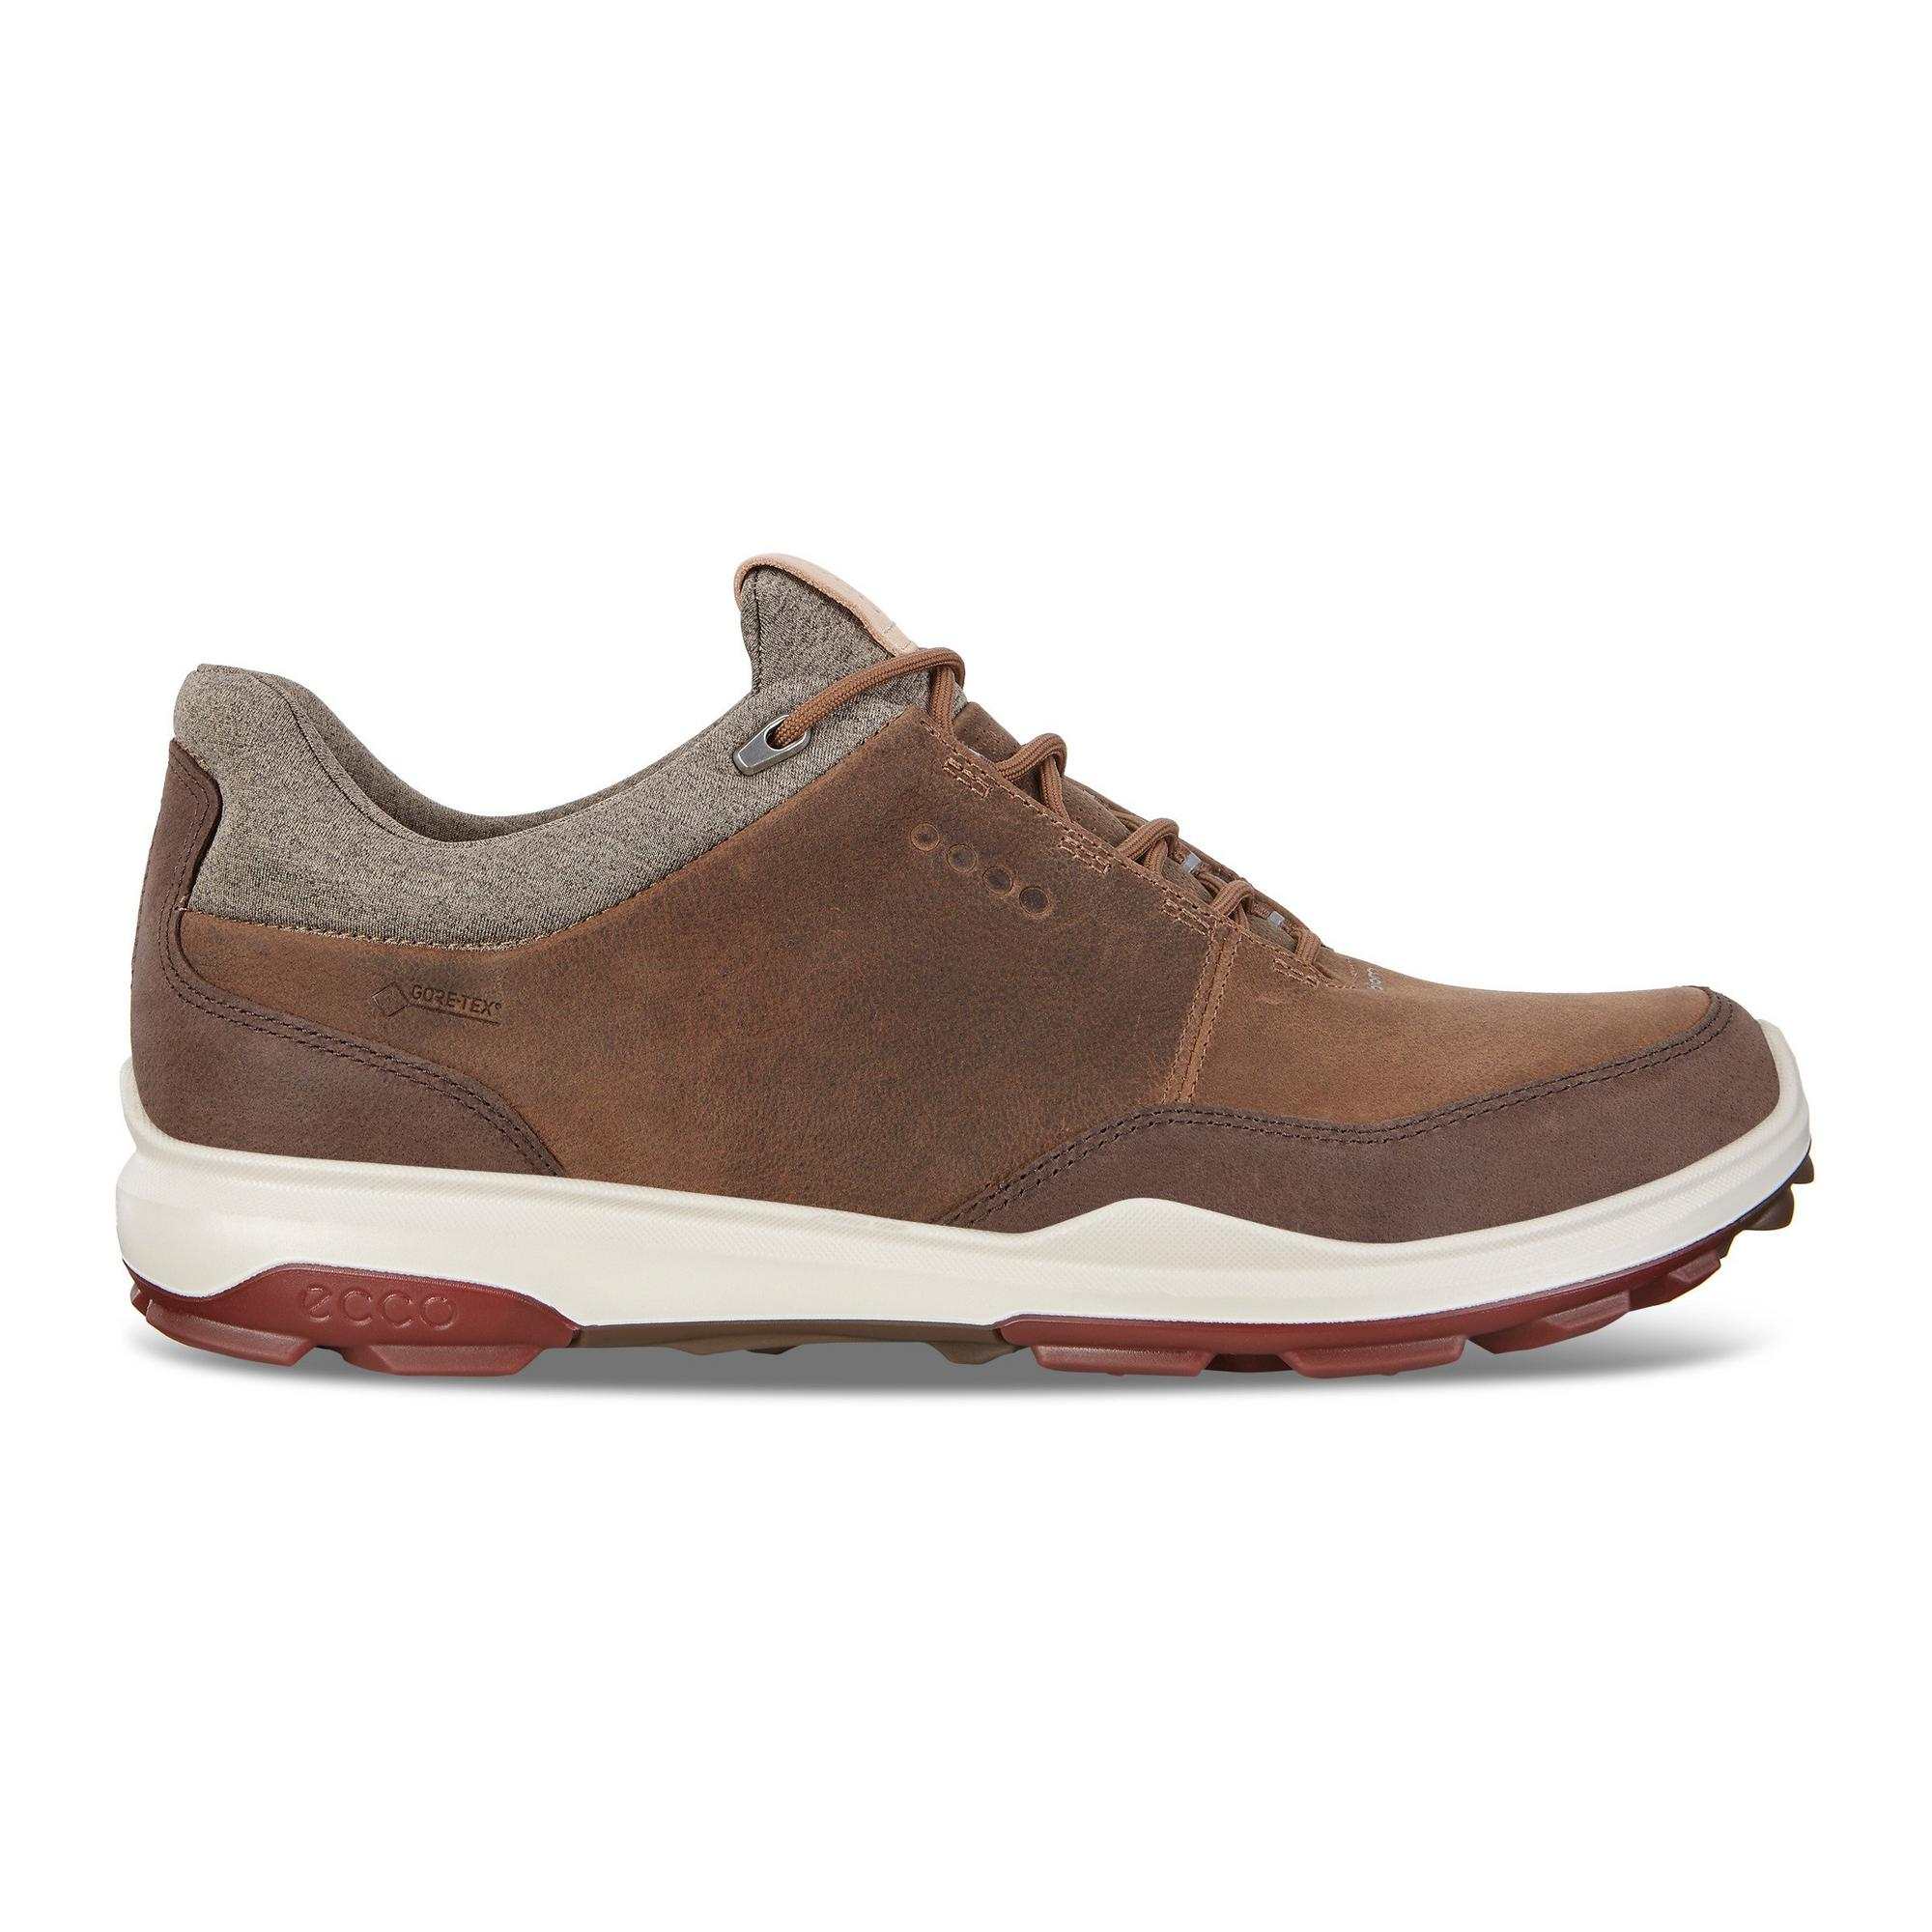 Men's Goretex Biom Hybrid 3 Nubuck Spikeless Golf Shoe - BROWN